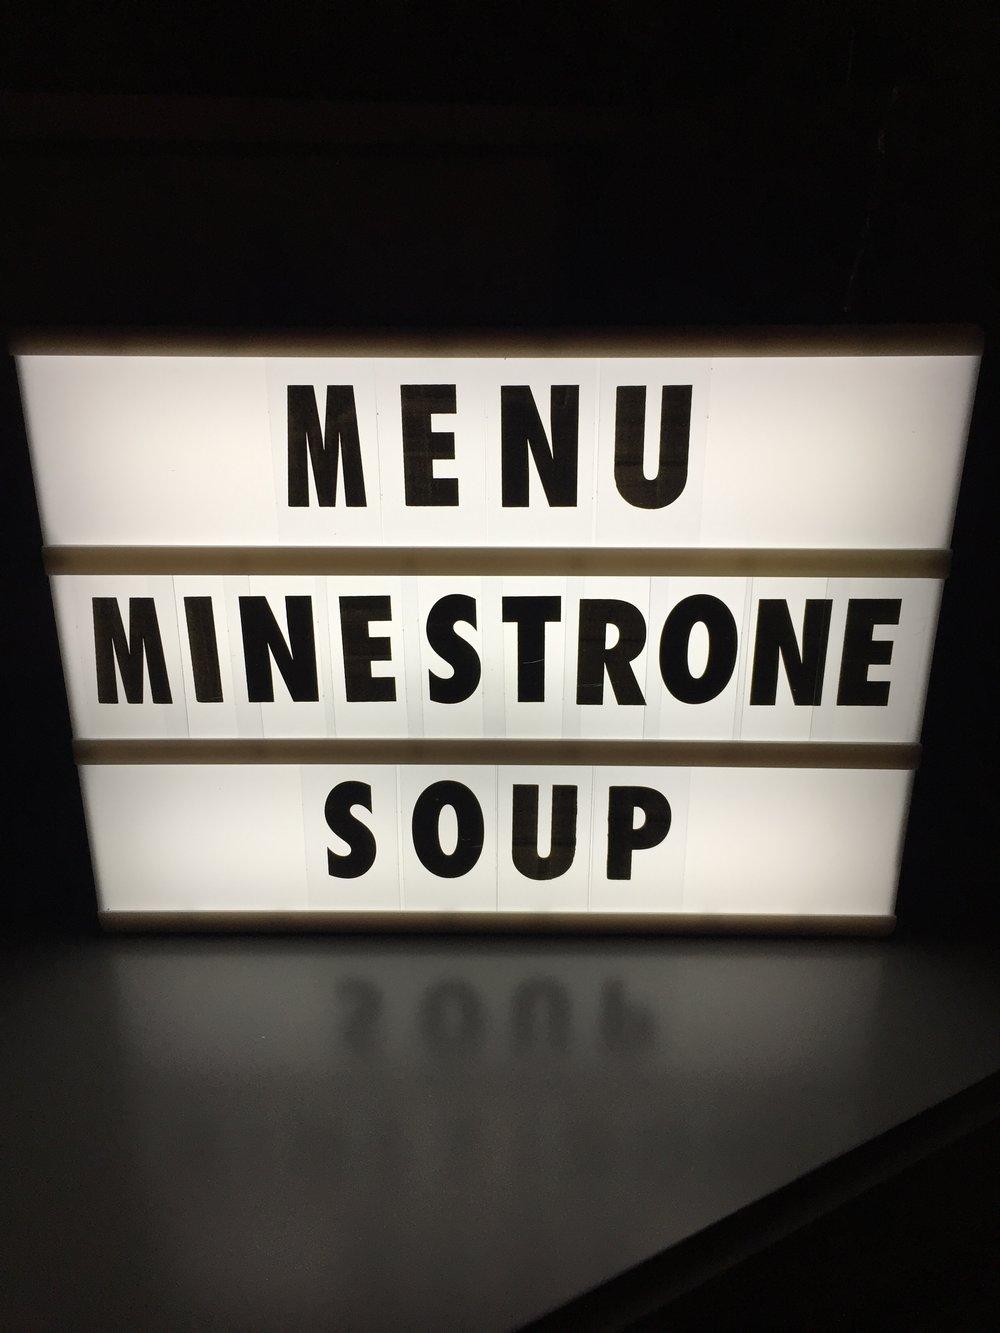 18MinestroneSoup1.JPG